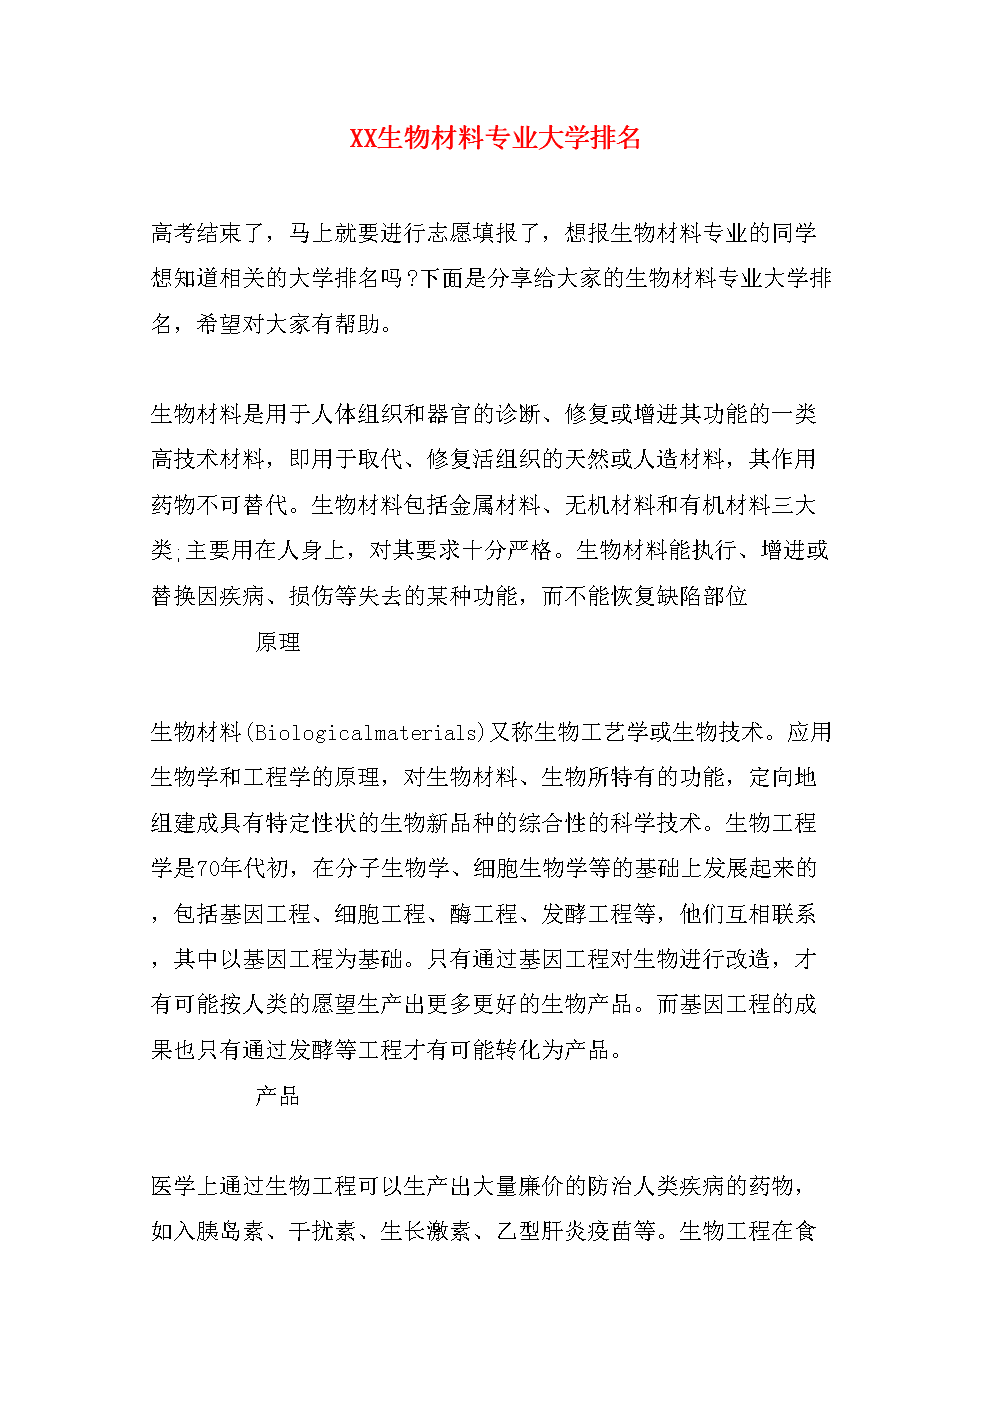 XX生物材料专业大学排名.doc